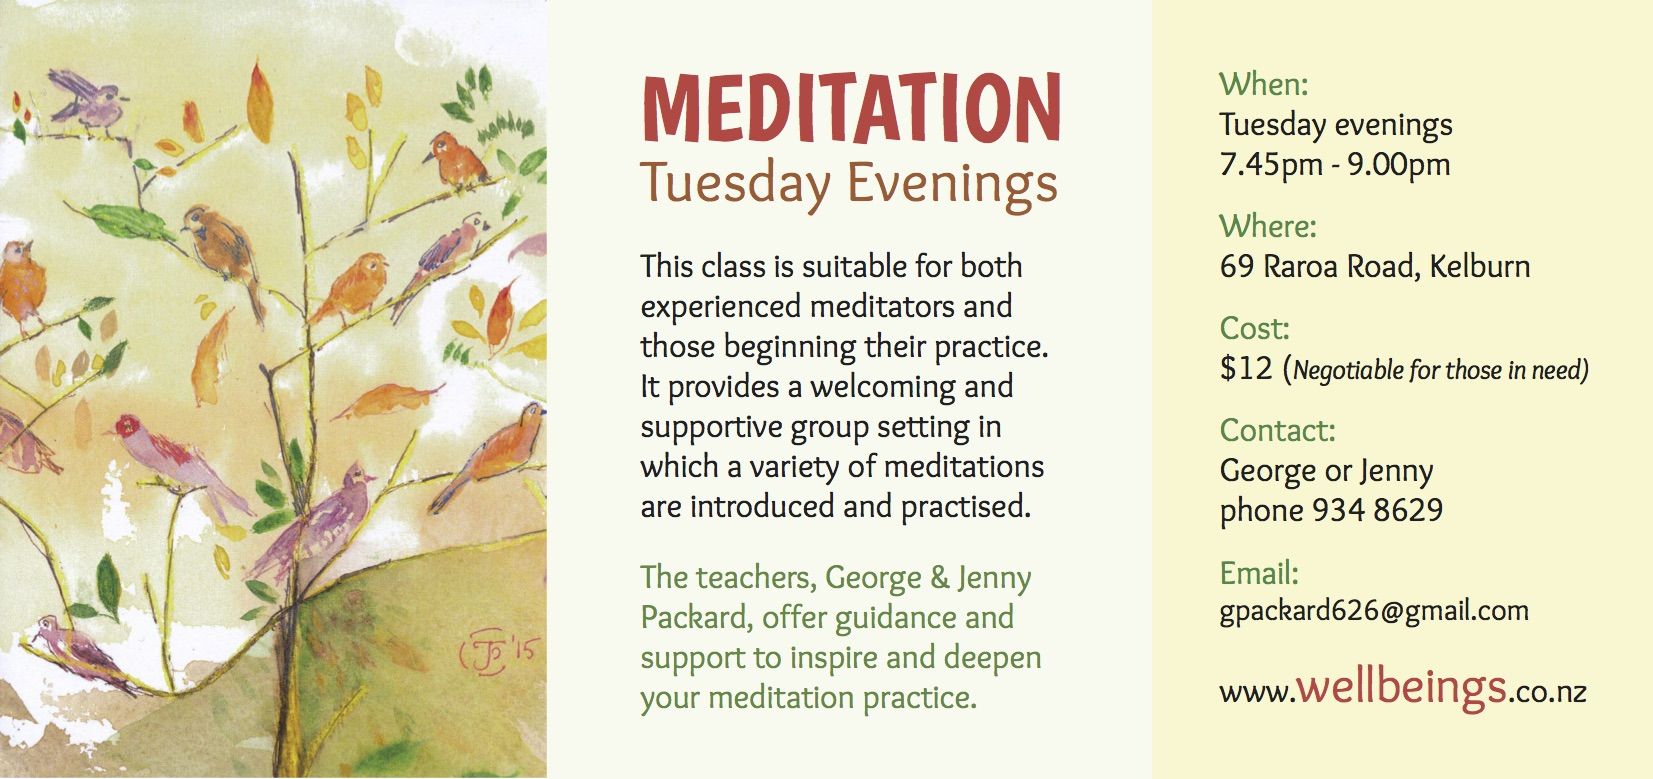 Tuesday Meditation a5d 2018